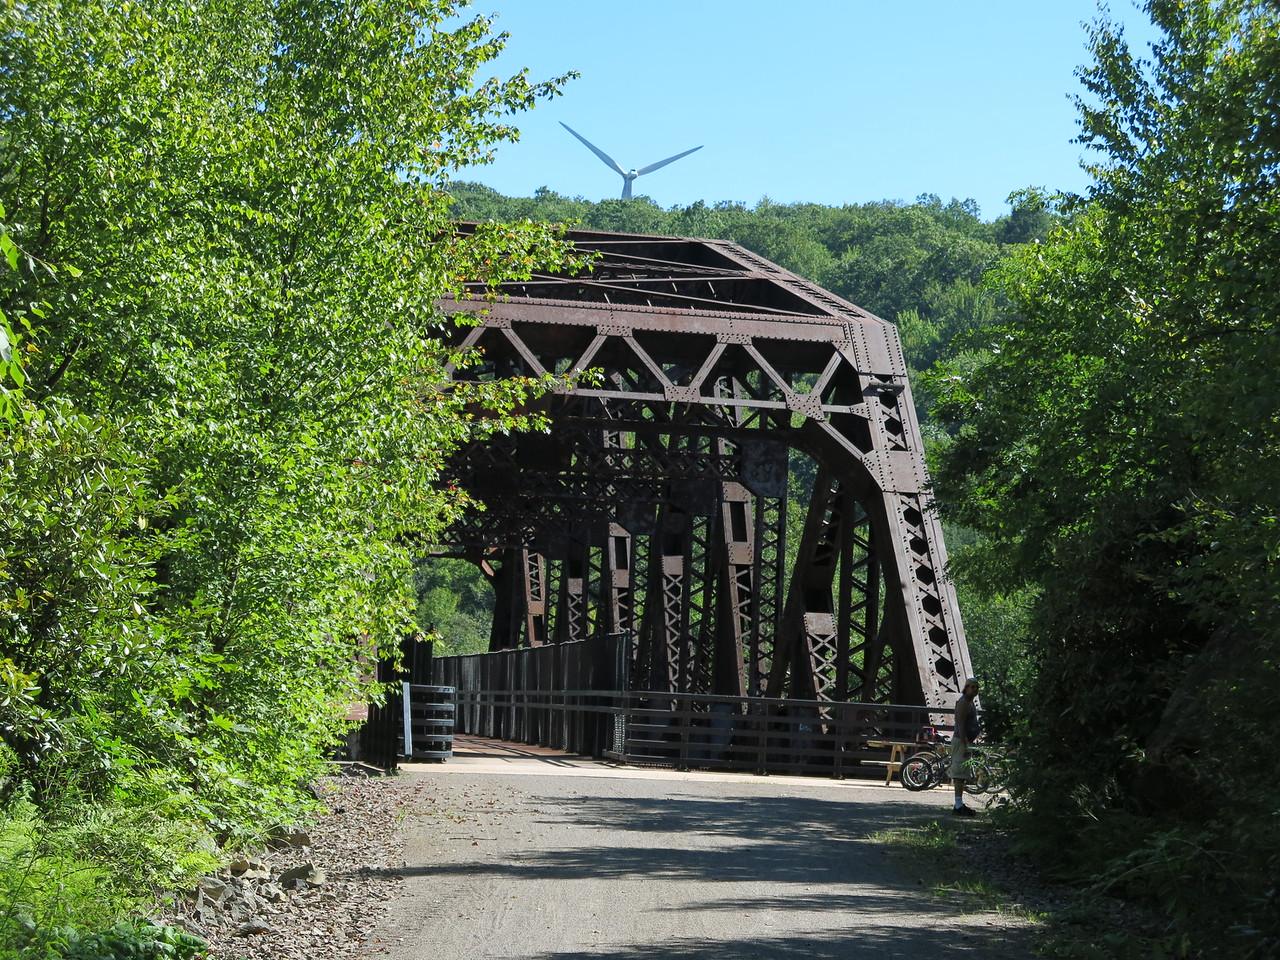 Keystone Viaduct, MP 30